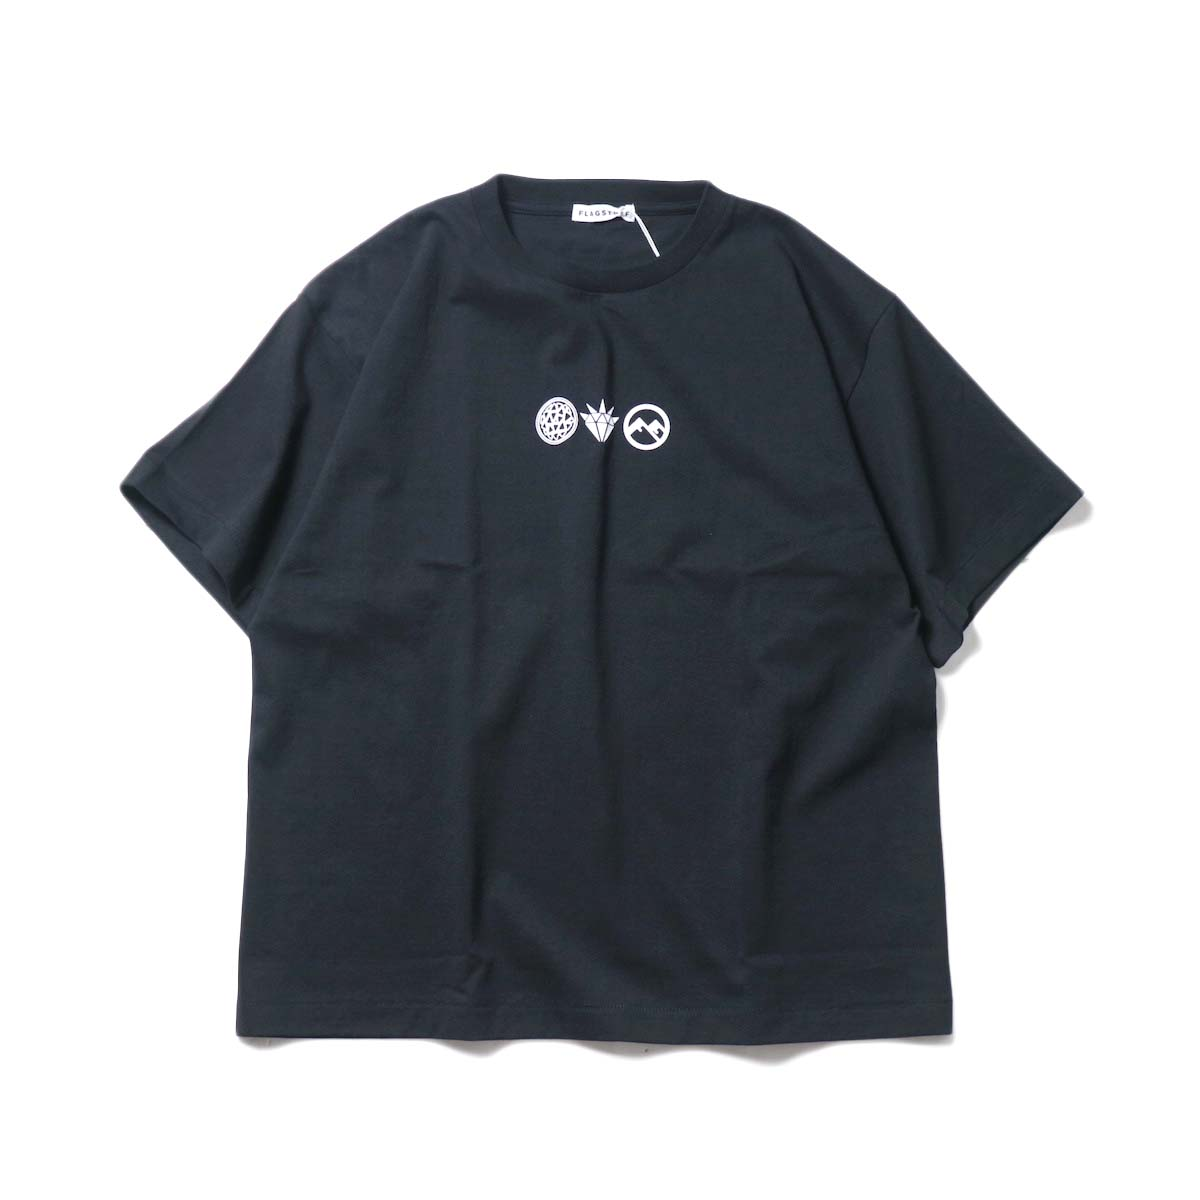 F-LAGSTUF-F × 鶴仙園 × Spycygem / Cactus Tee (Black)